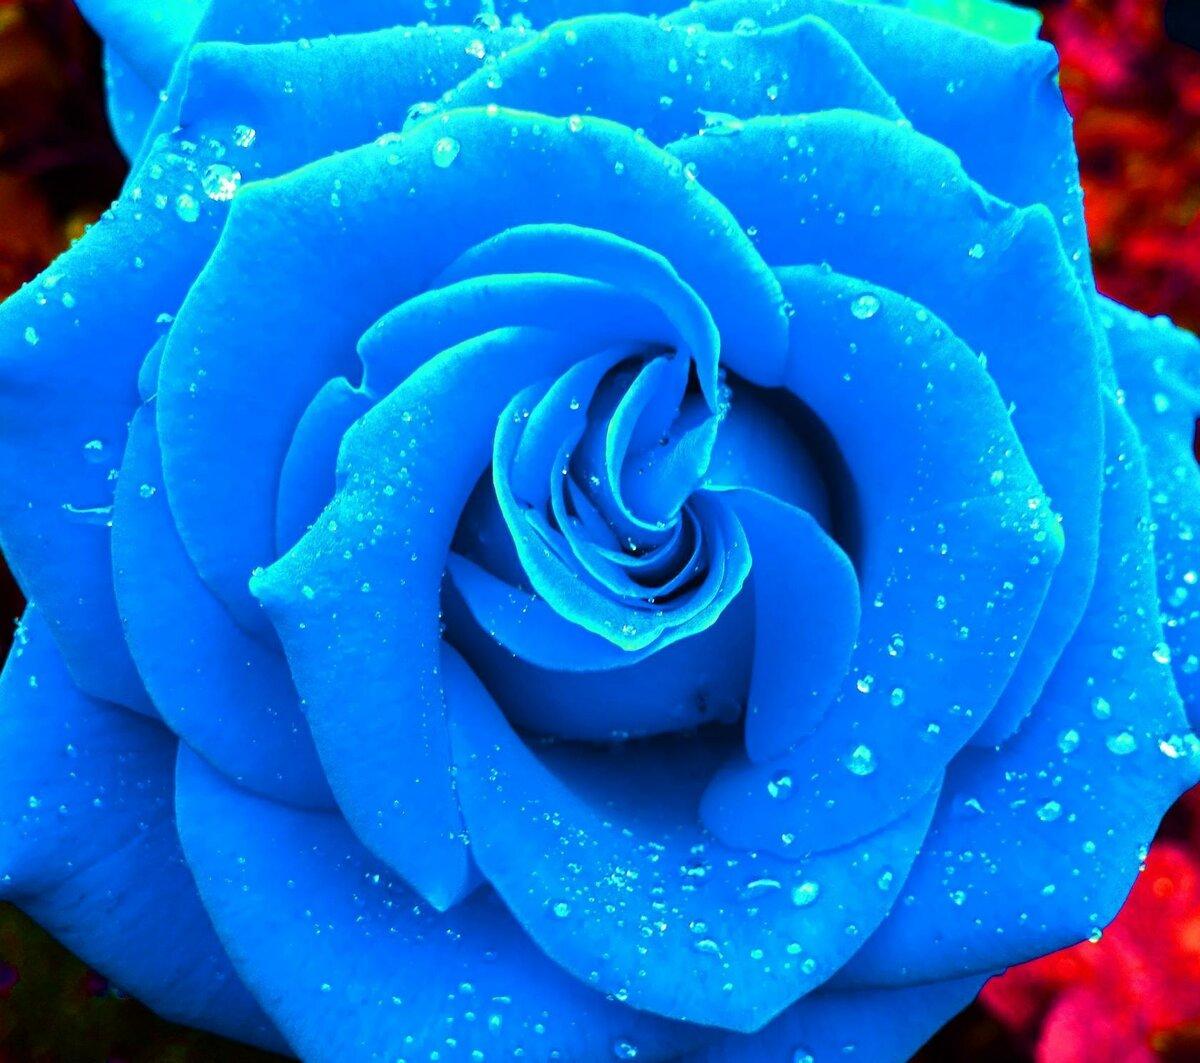 кисло-сладкий цветок синяя роза картинка шире, тем